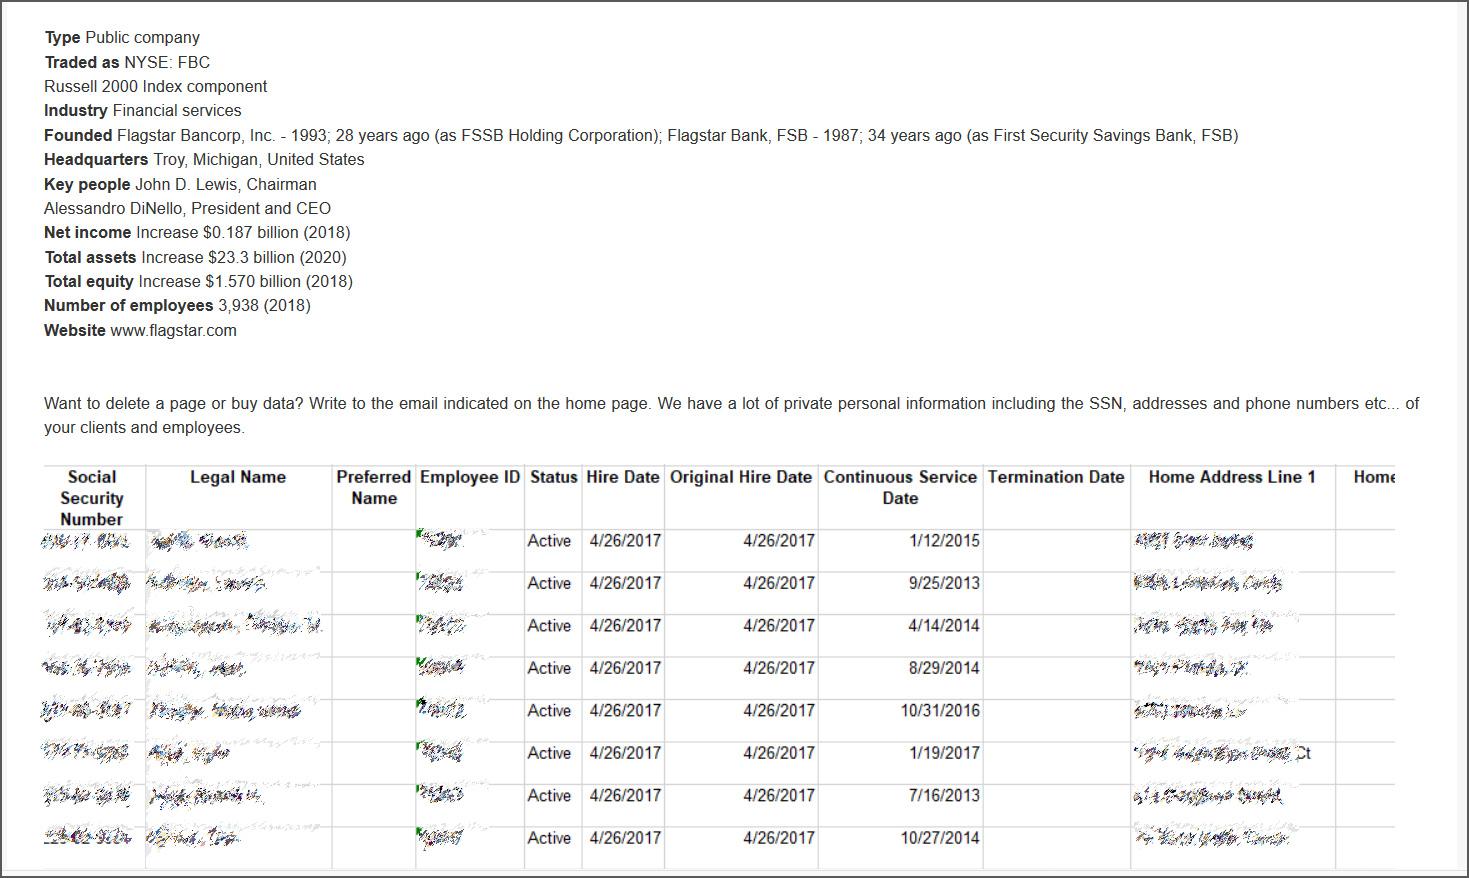 Screenshots of Flagstar data shared on Clop ransomware site